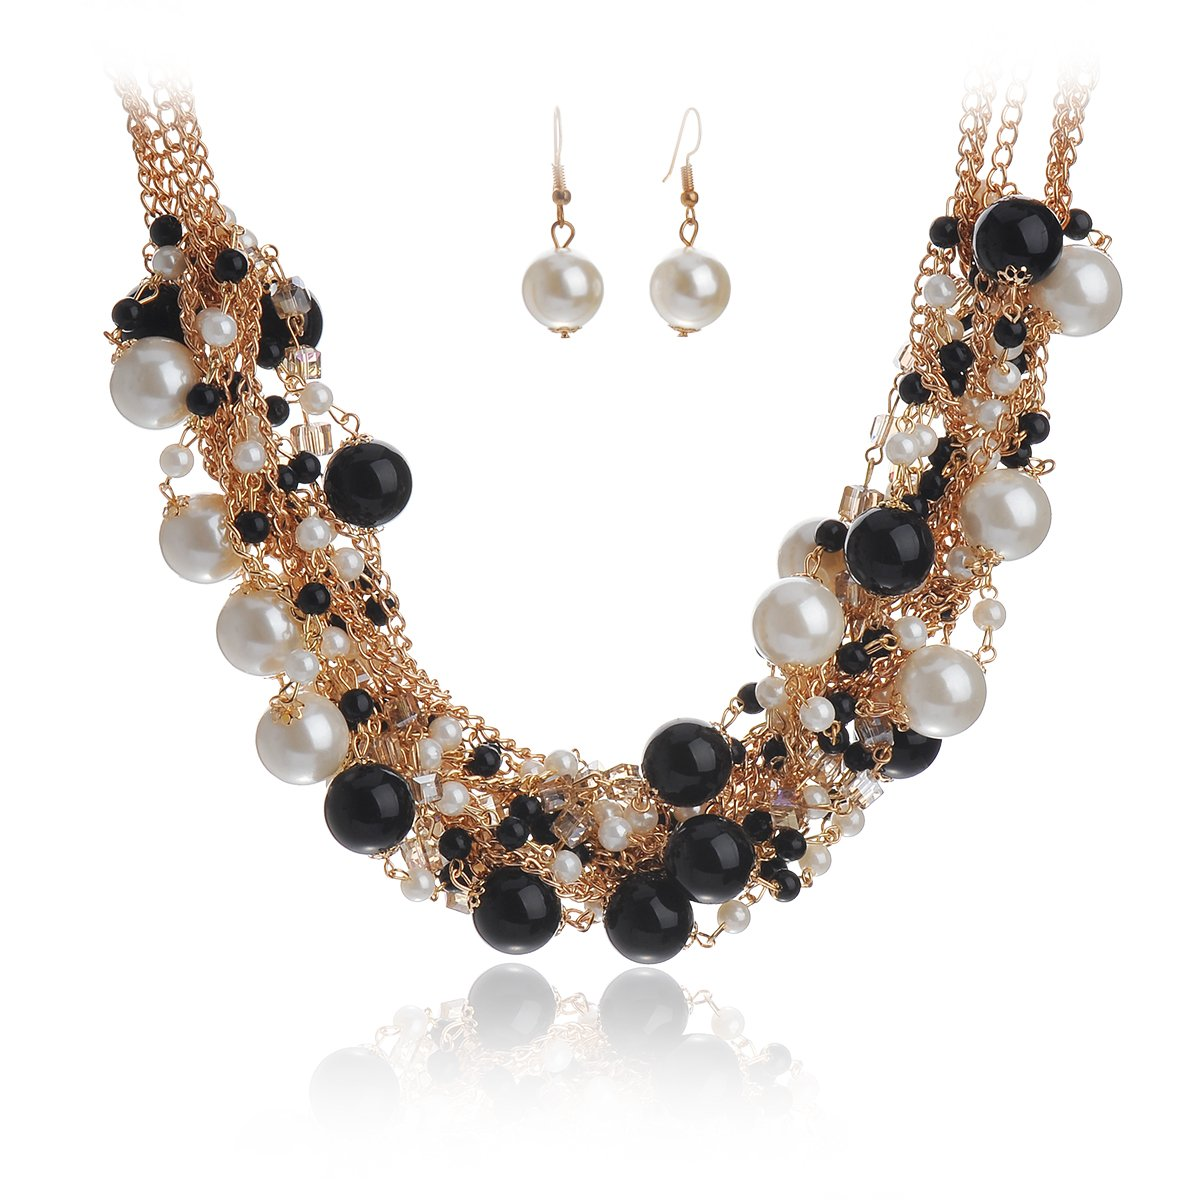 IPINK Fashion Charm Jewelry Pendant Faux Pearl Choker Chunky Statement bib Necklace and Earrings Set ZZZ003